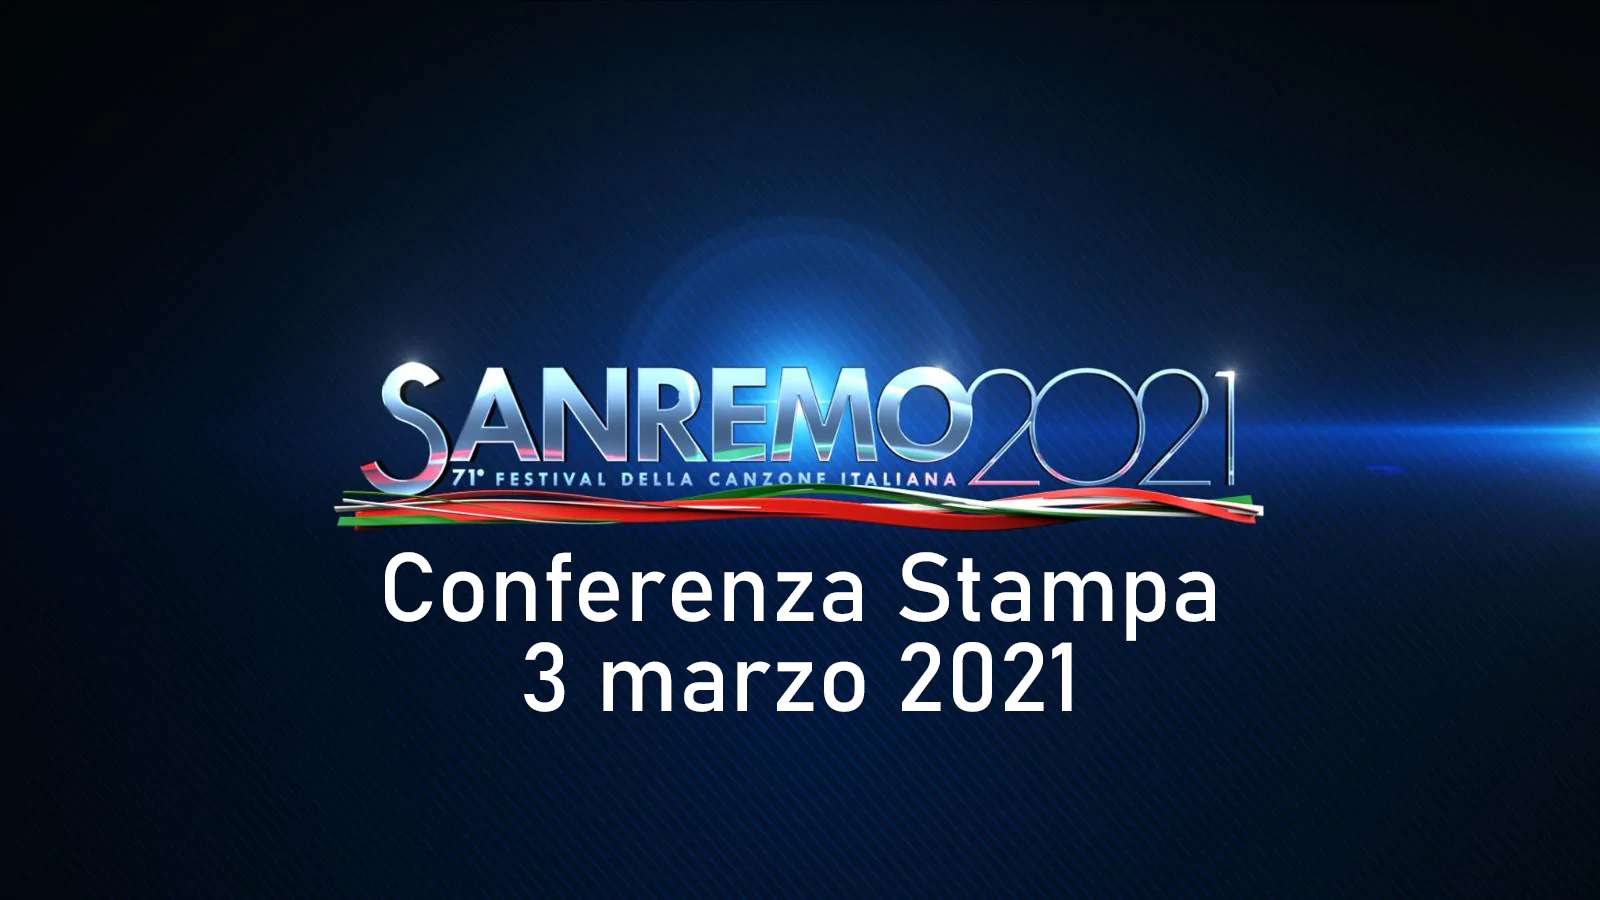 Sanremo 2021 conferenza stampa 3 marzo